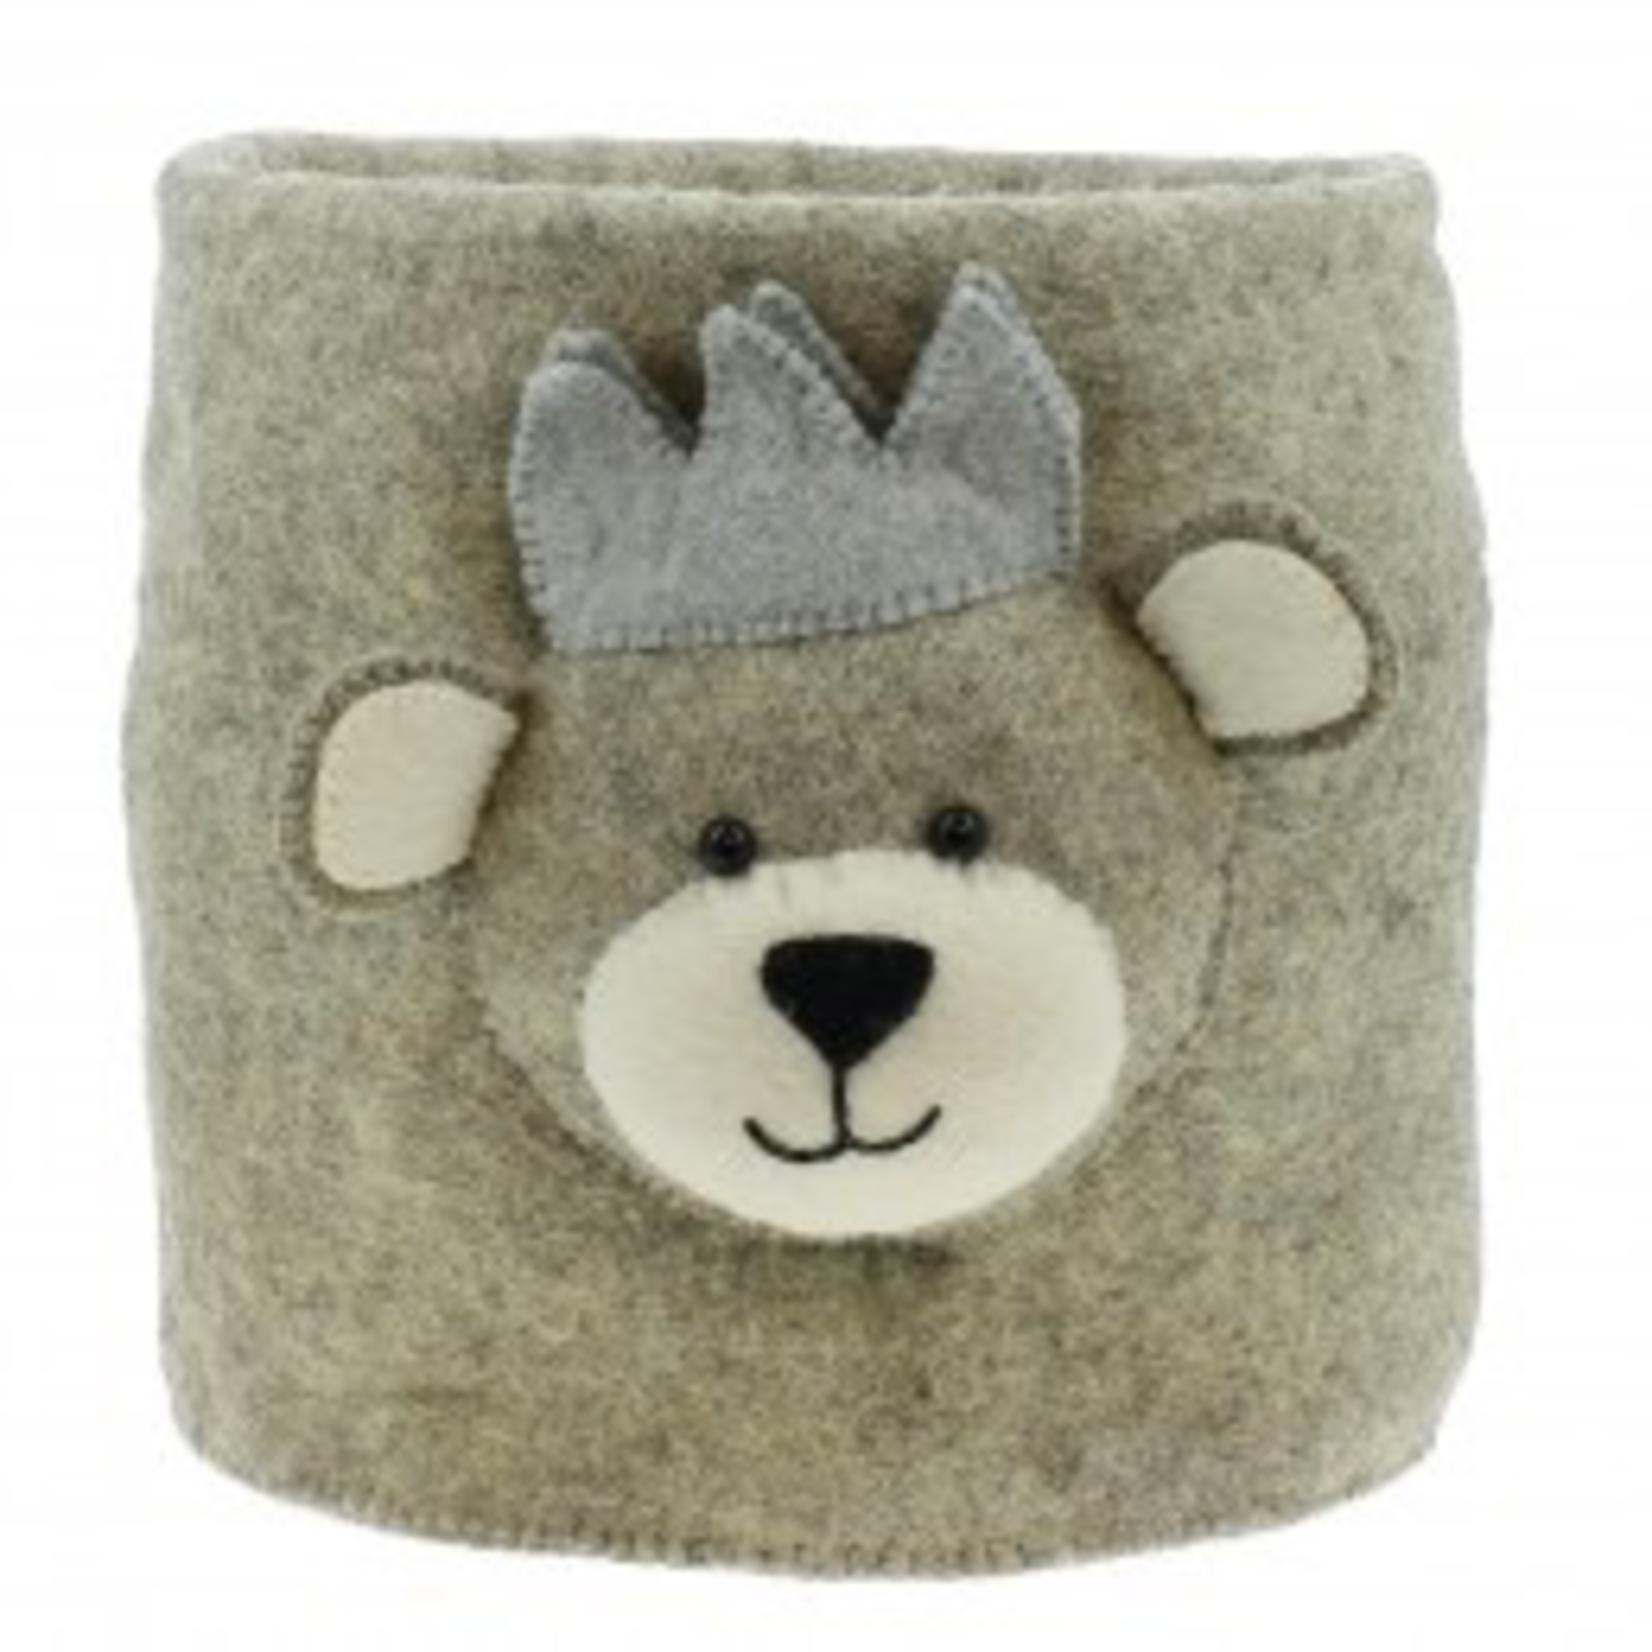 Fiona Walker Fiona Walker Storage Bag - Baby Bear with Crown